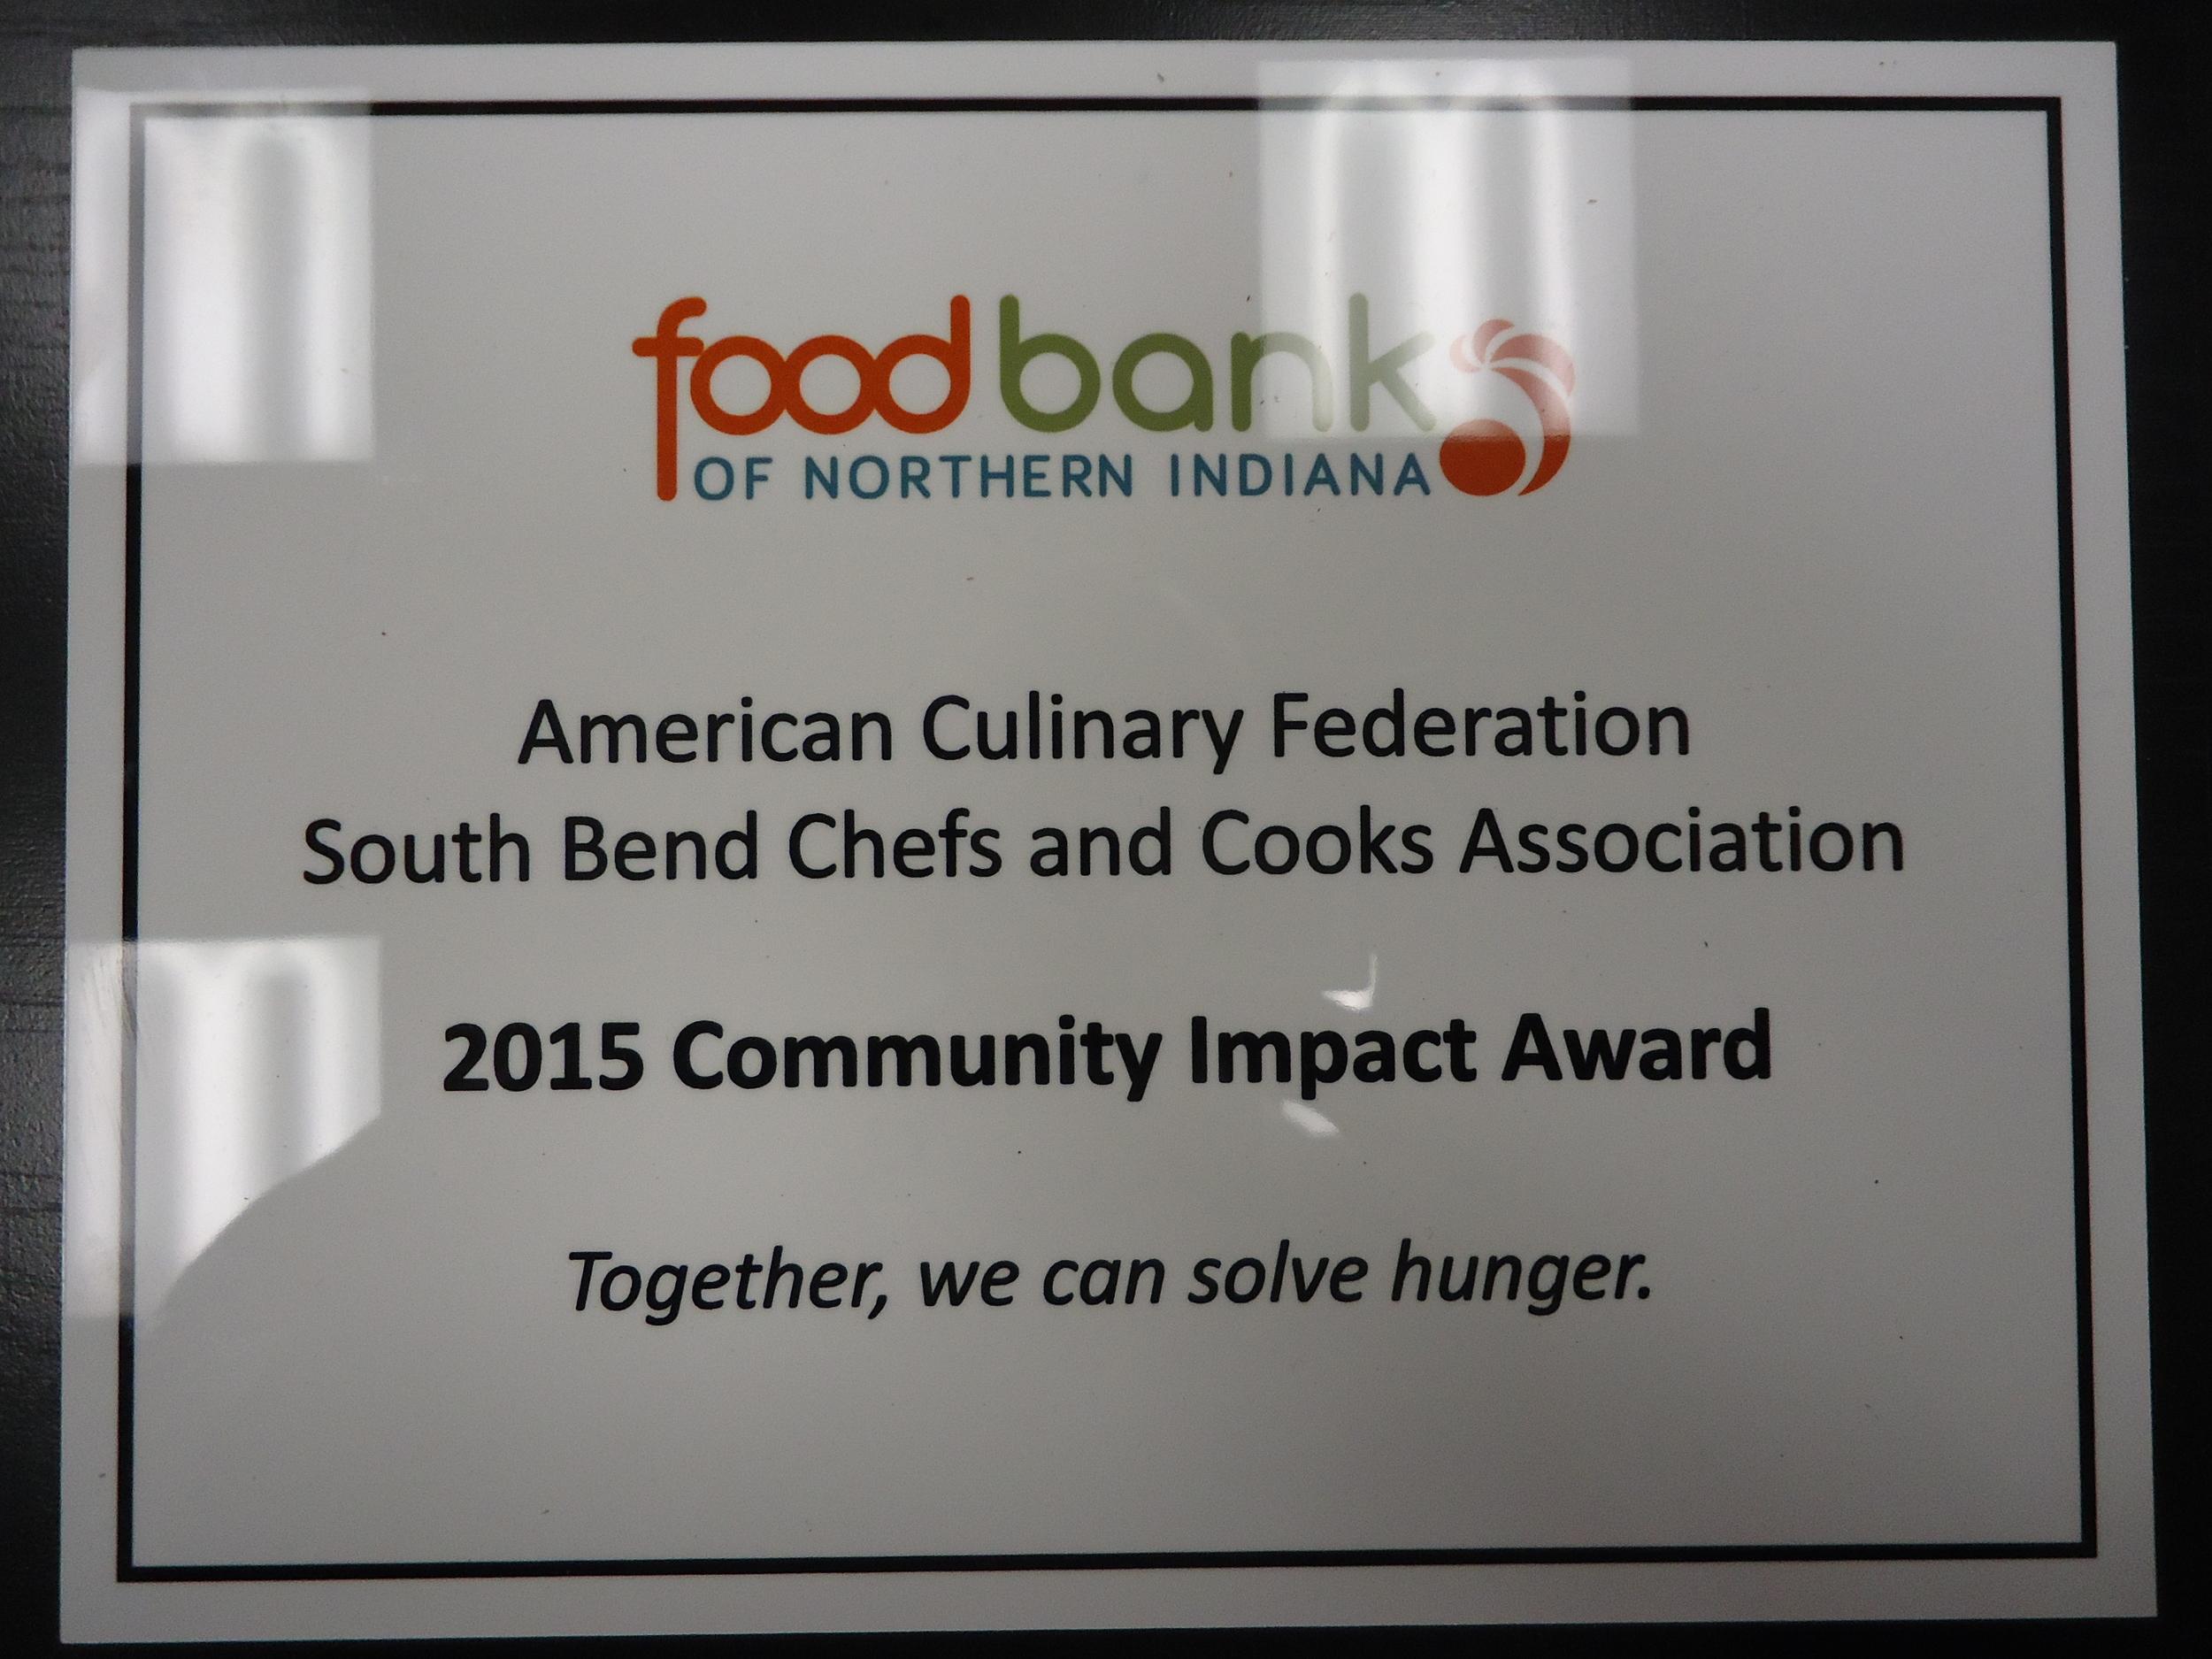 Food bank Impact Award.jpg